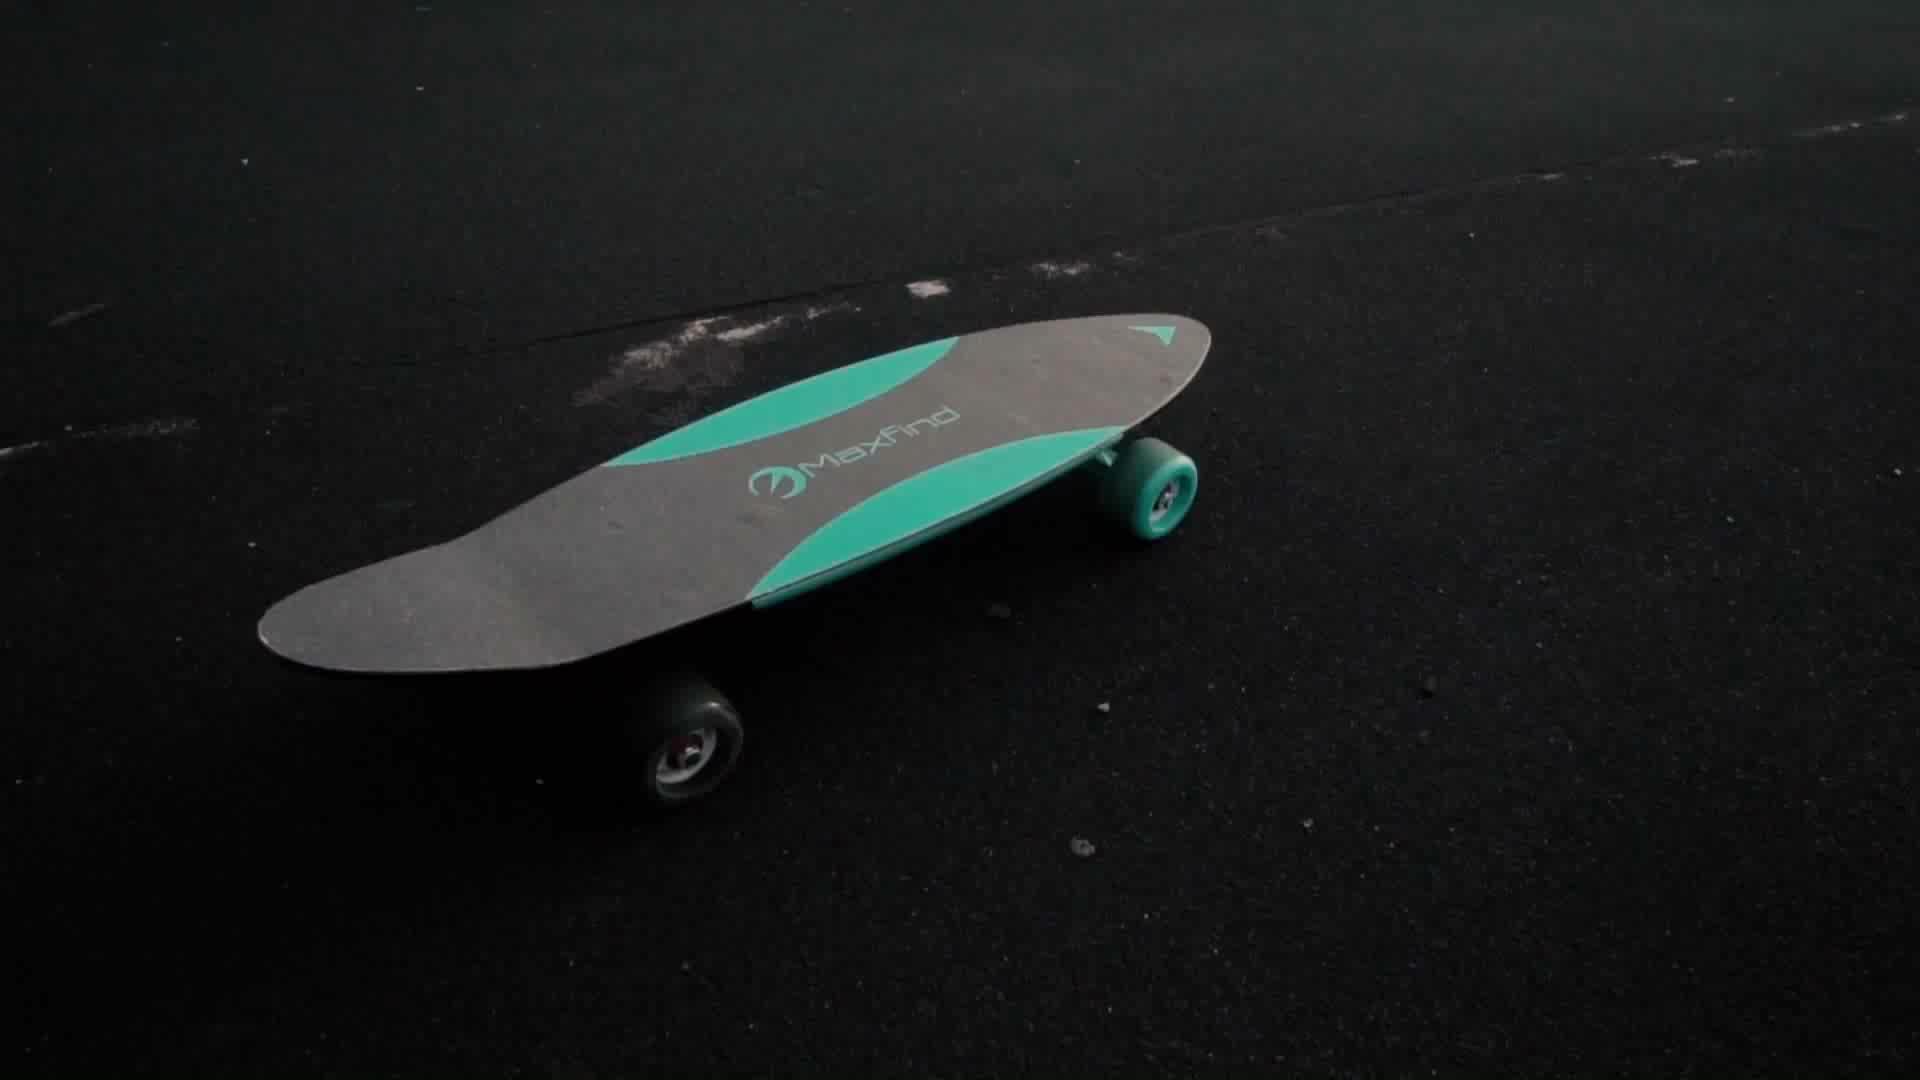 Maxfind mini smart board electric skateboard in Skate Board